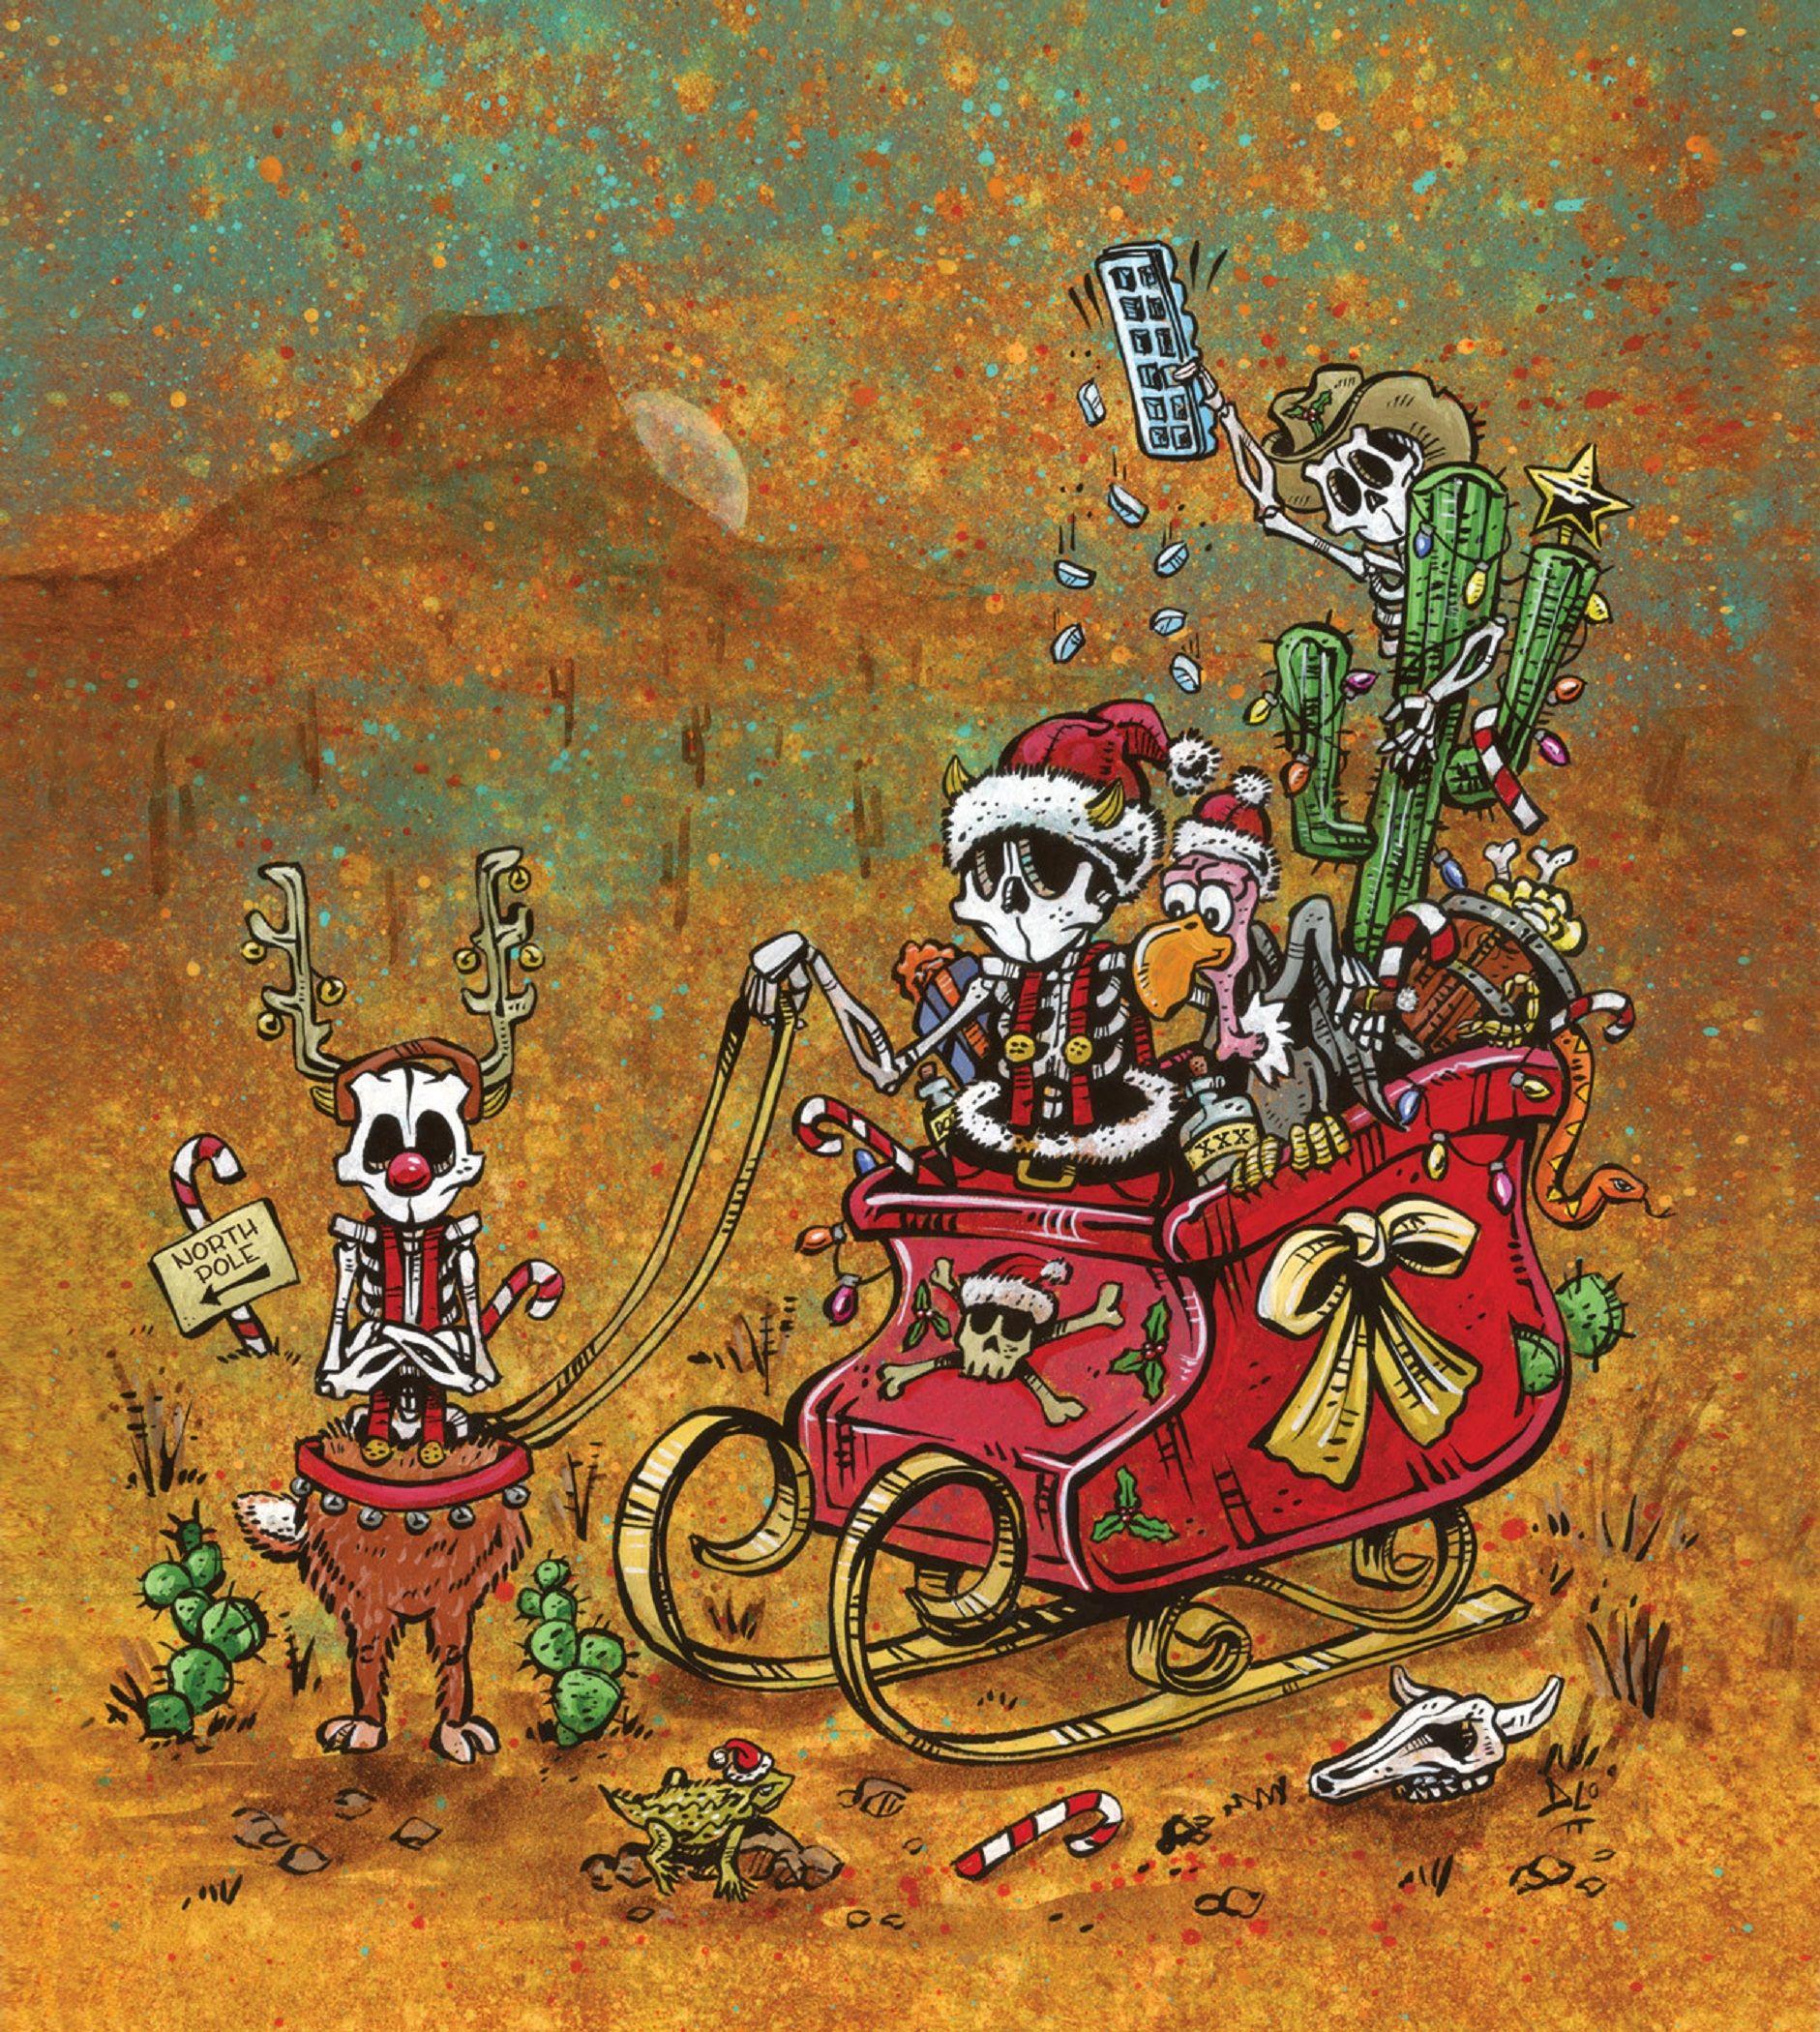 Christmas sleigh day of the dead artist david lozeau david christmas sleigh day of the dead artist david lozeau m4hsunfo